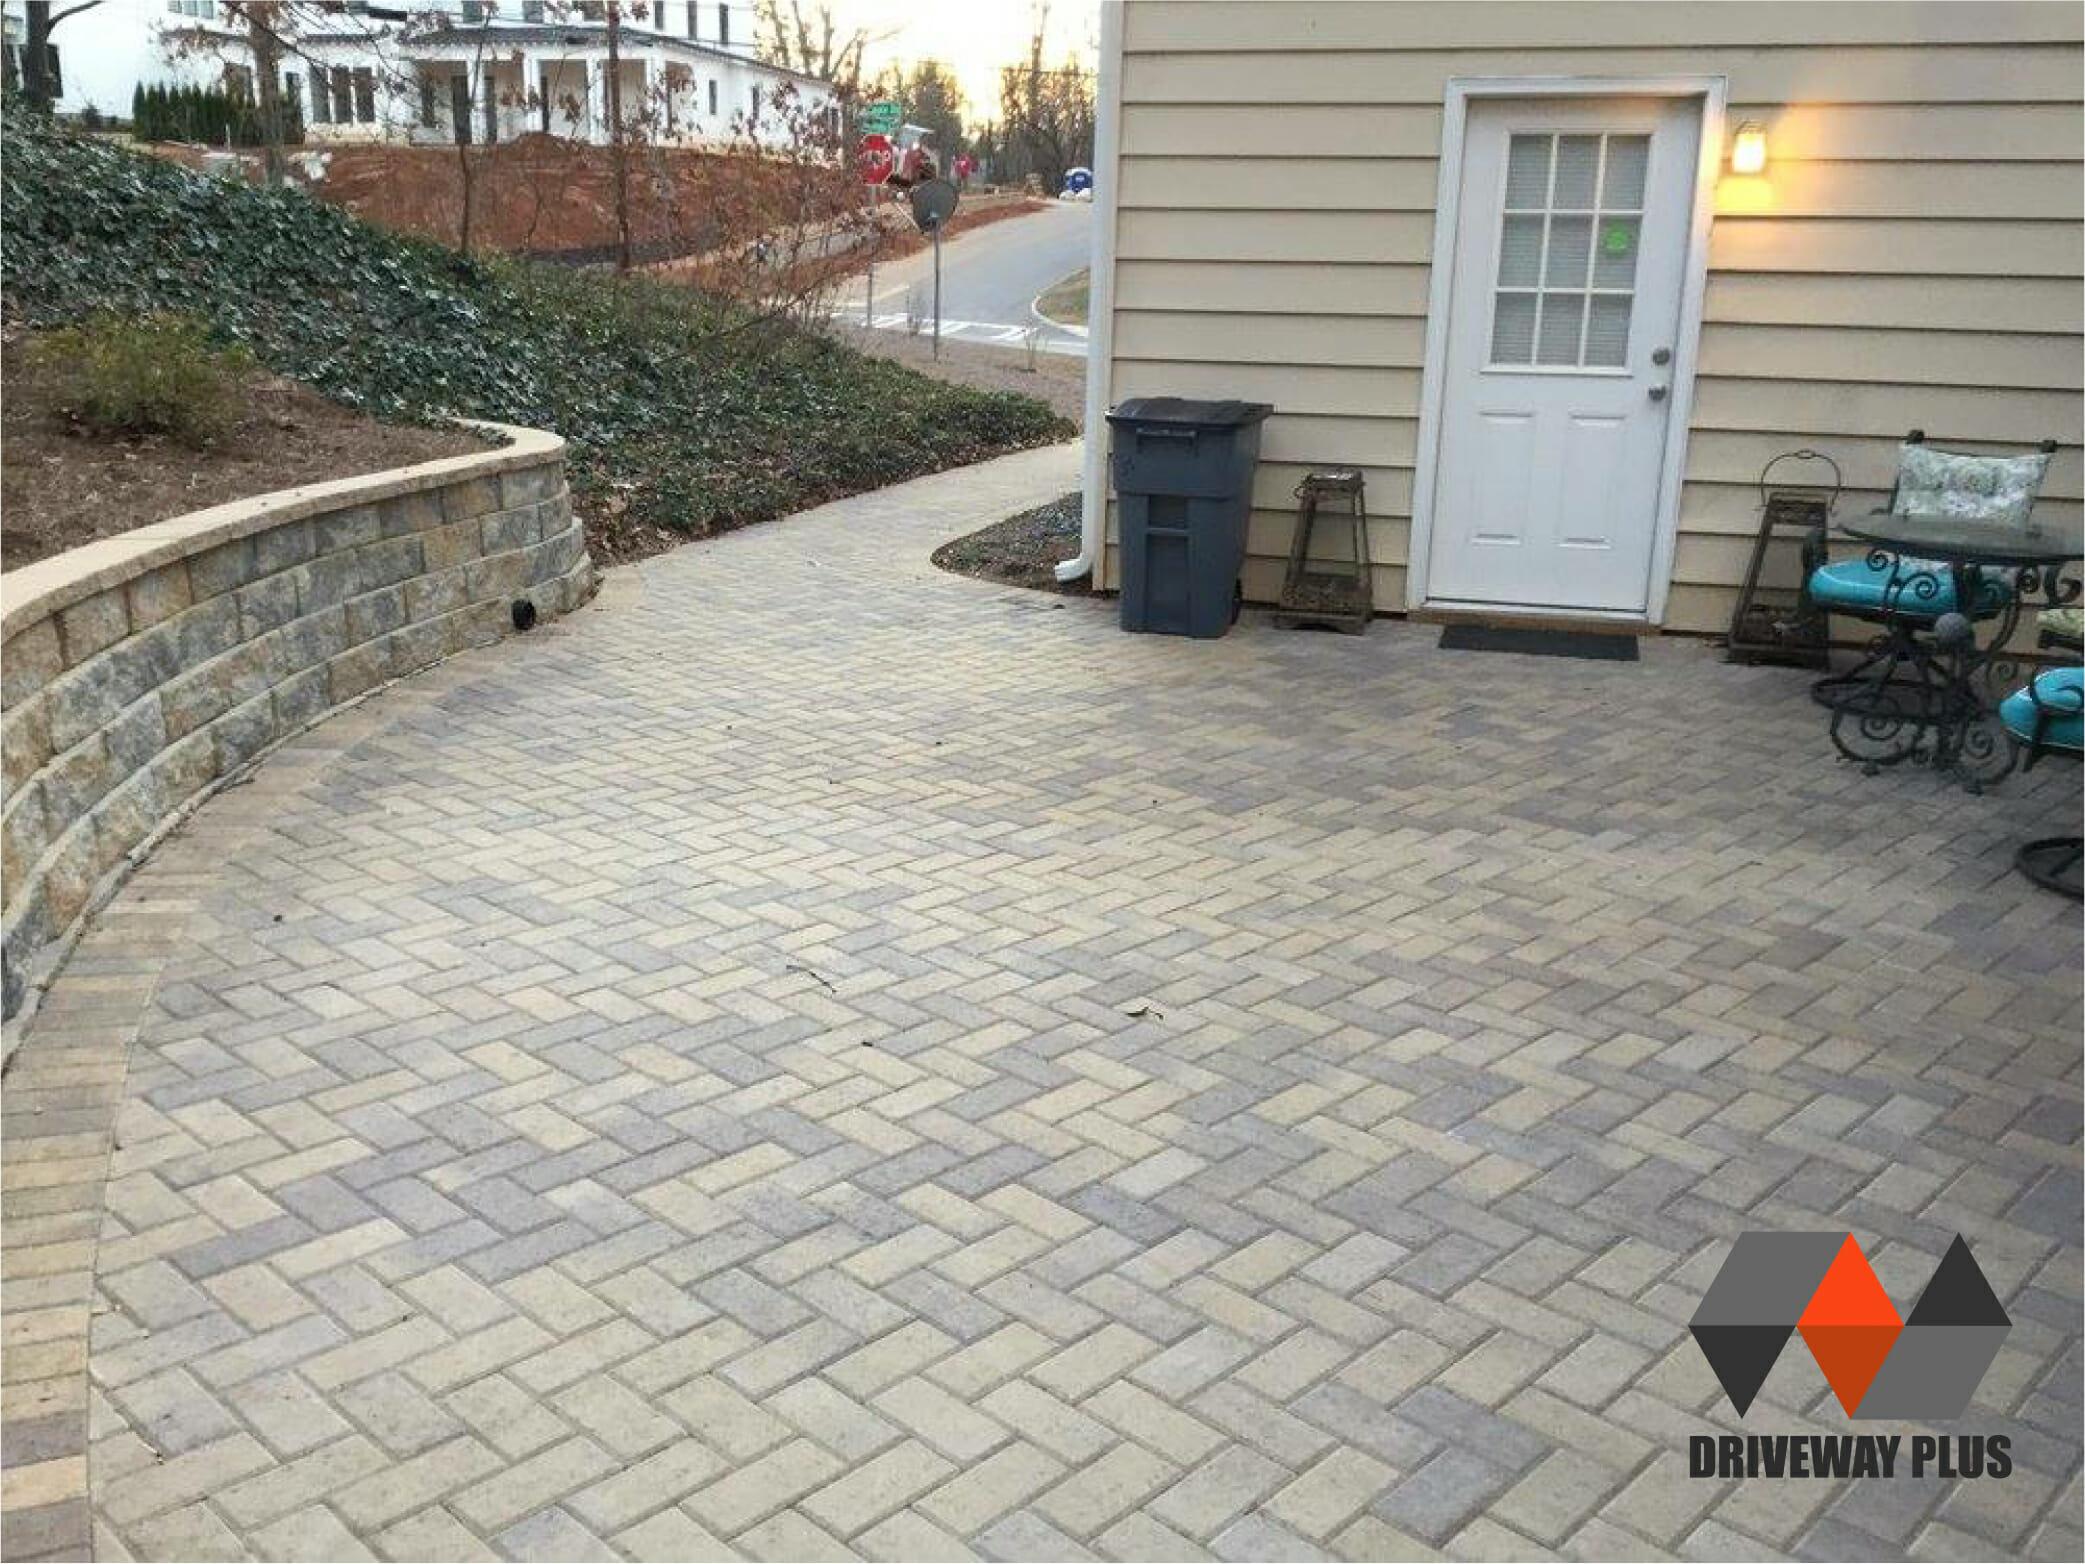 Patio, paver , stone, walkways, yard, porch, garden